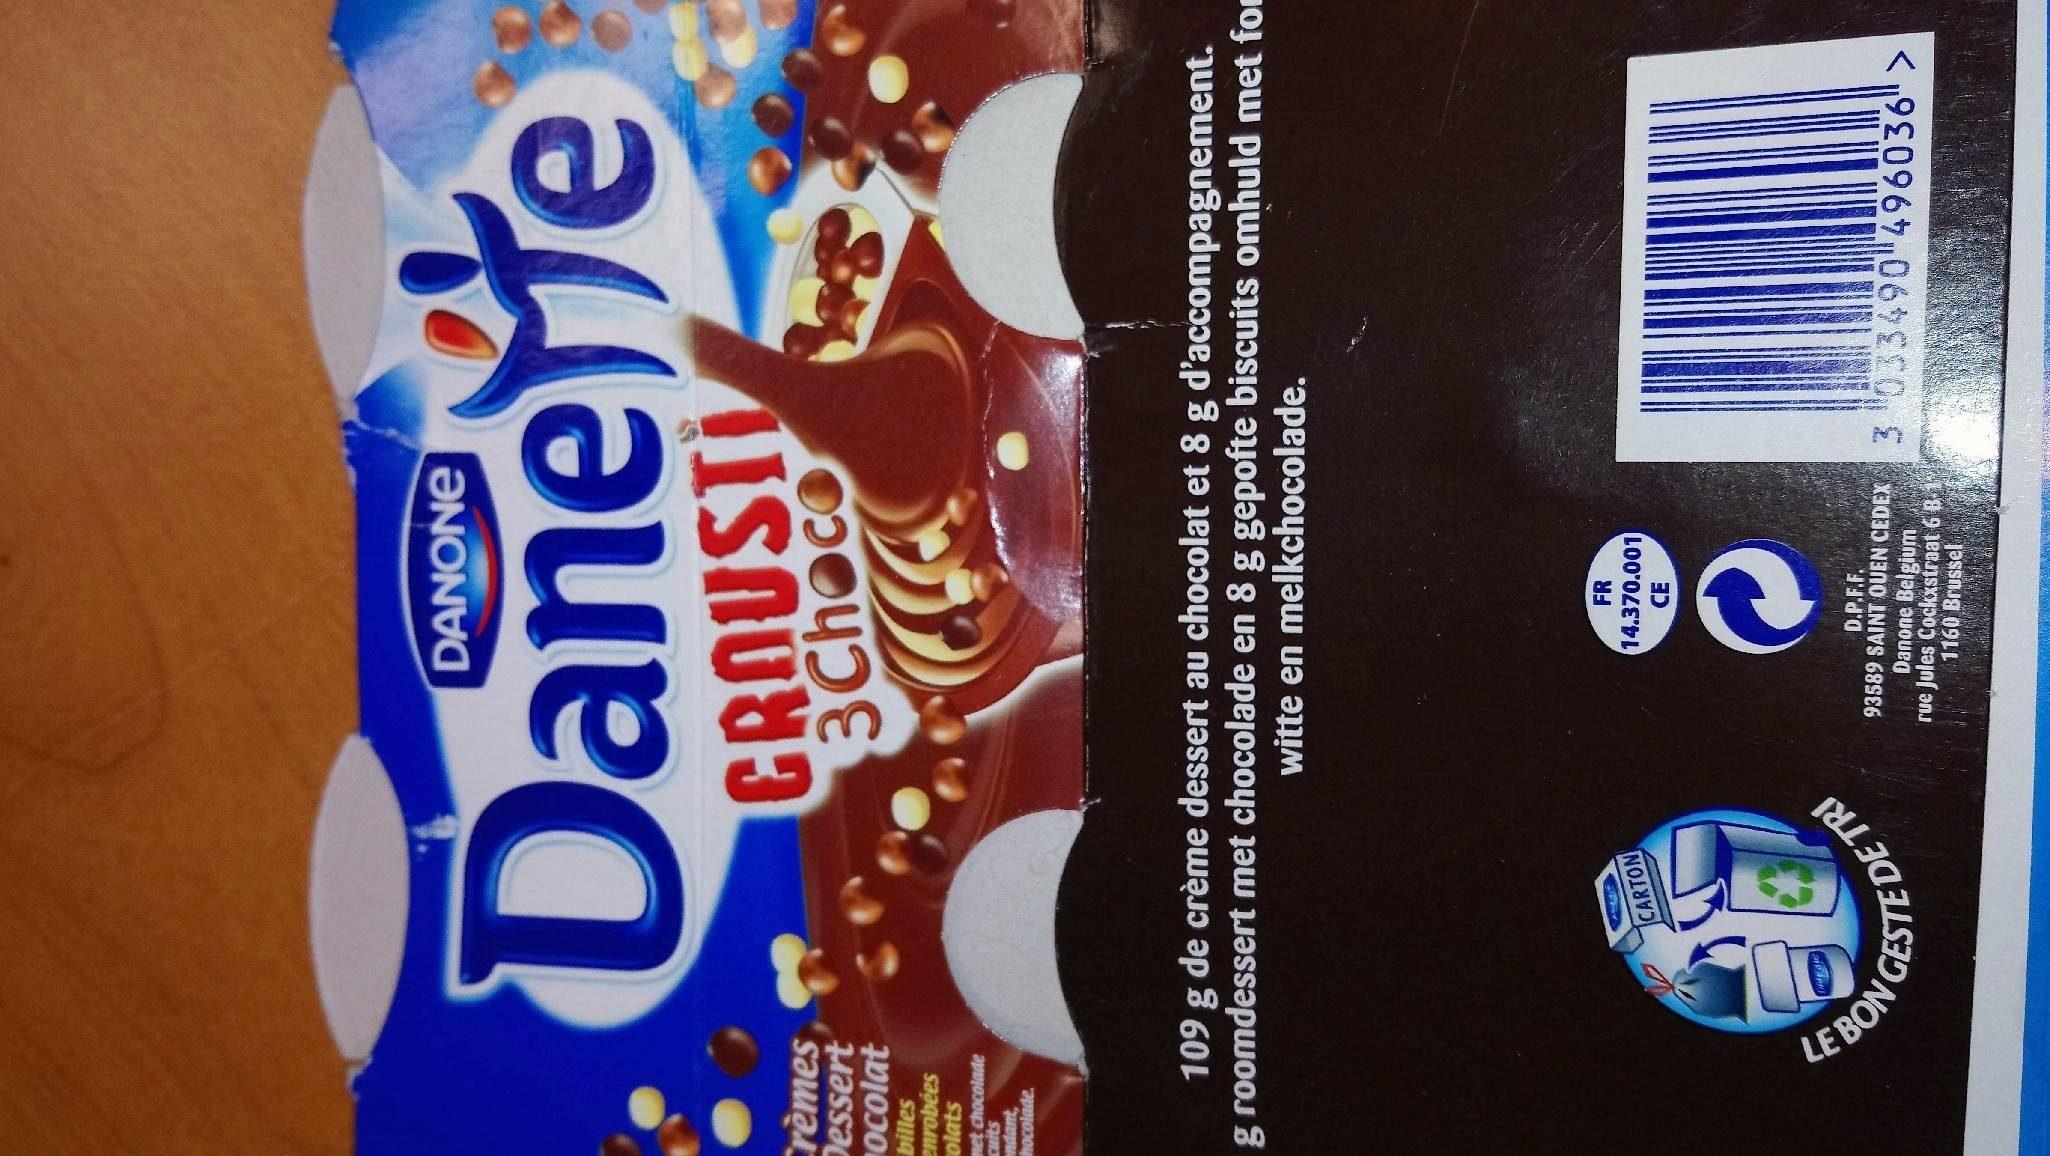 Danette croustillant 3 choco - Product - fr